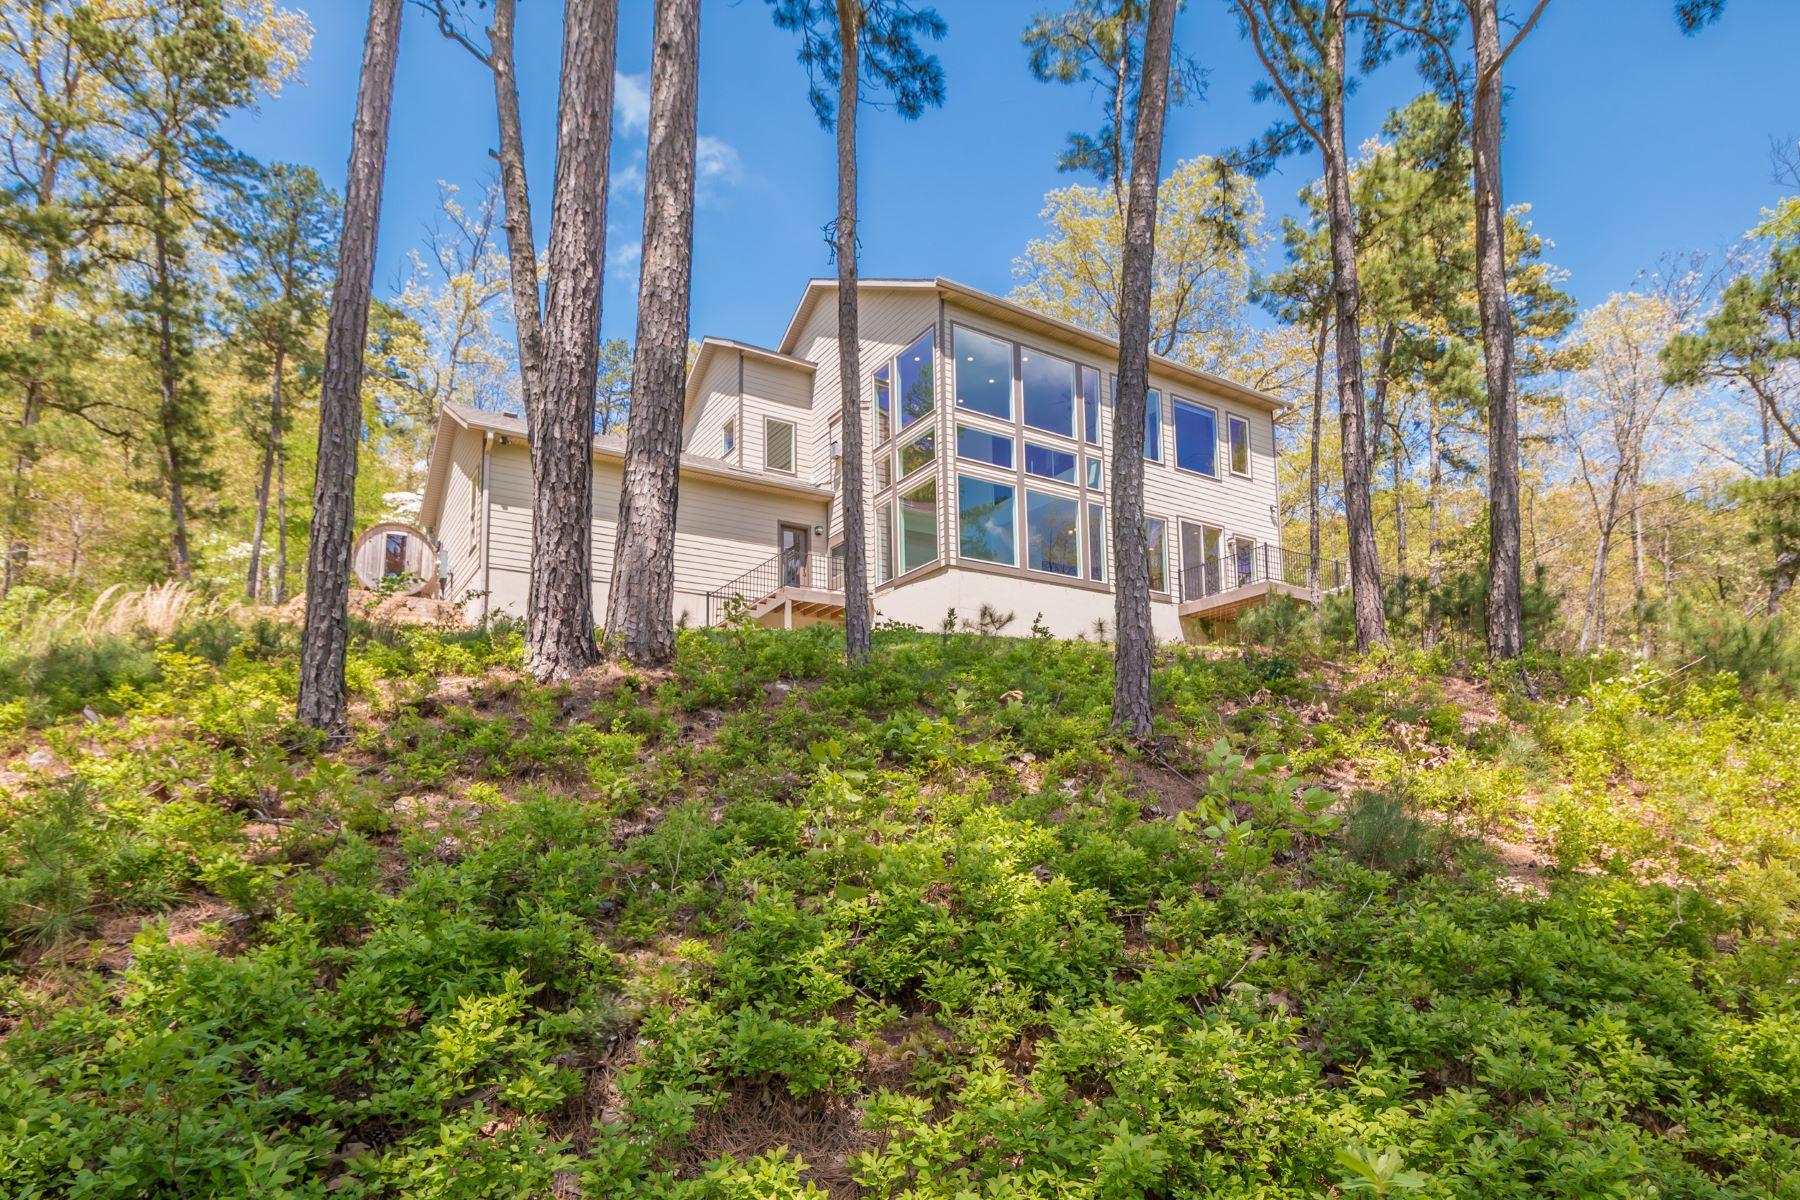 Single Family Homes for Sale at 2 Guist Lane Bella Vista, Arkansas 72714 United States